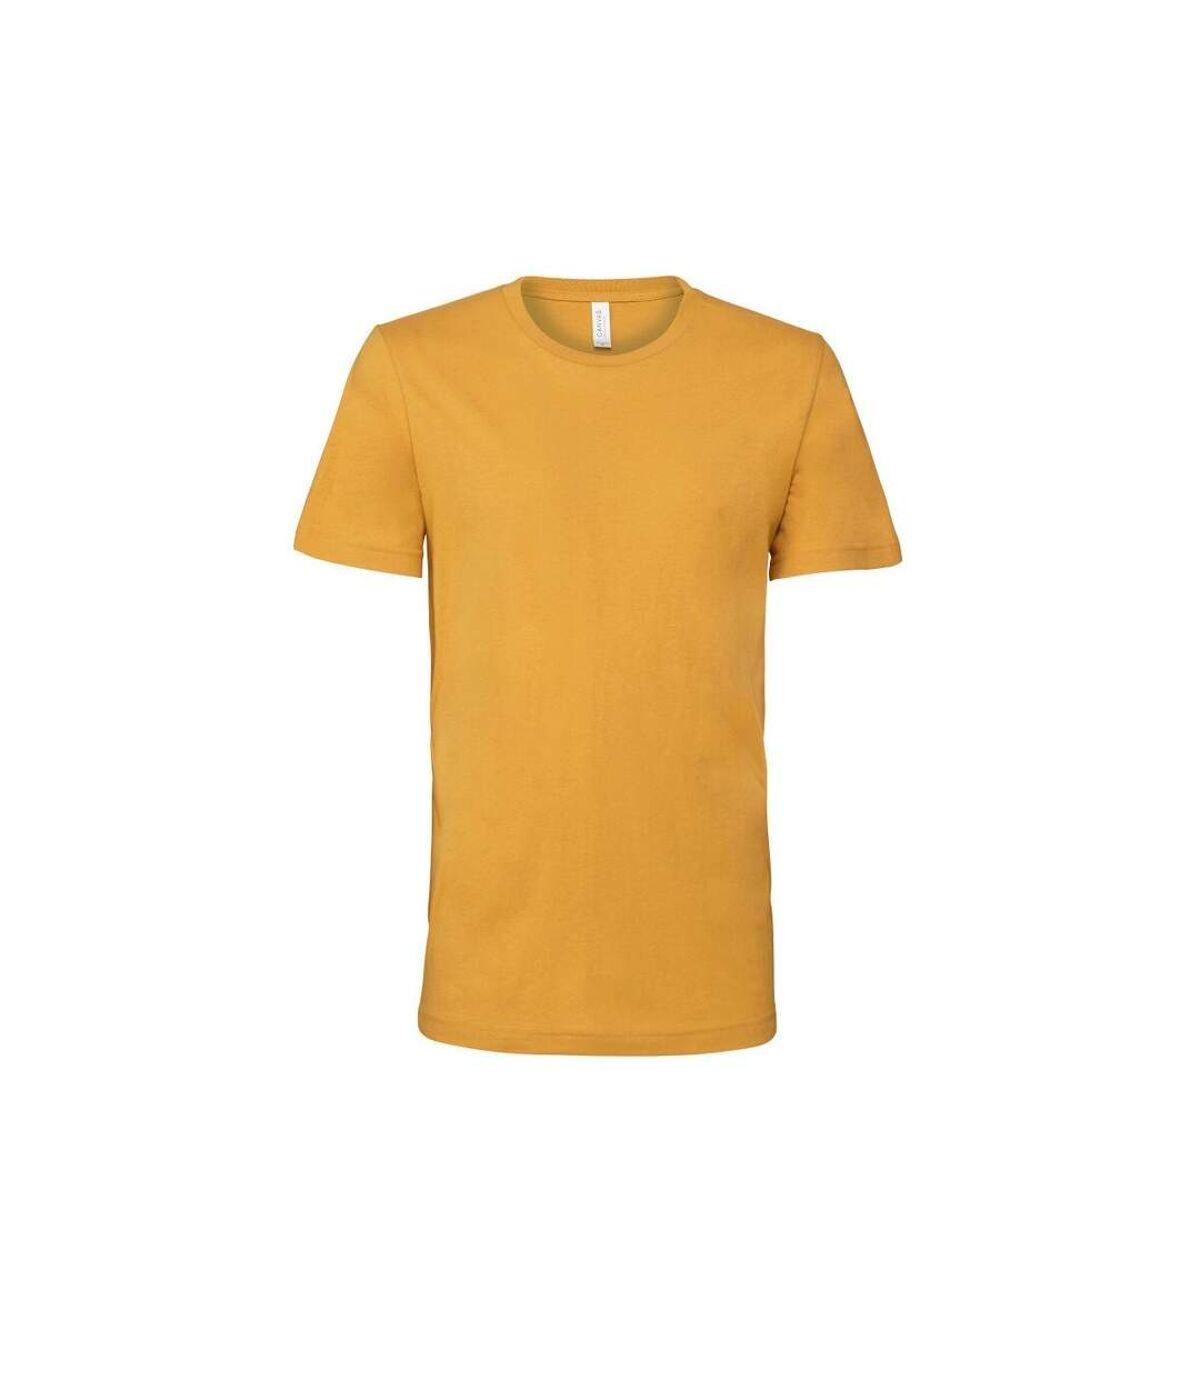 Canvas - T-shirt JERSEY - Hommes (Moutarde) - UTBC163